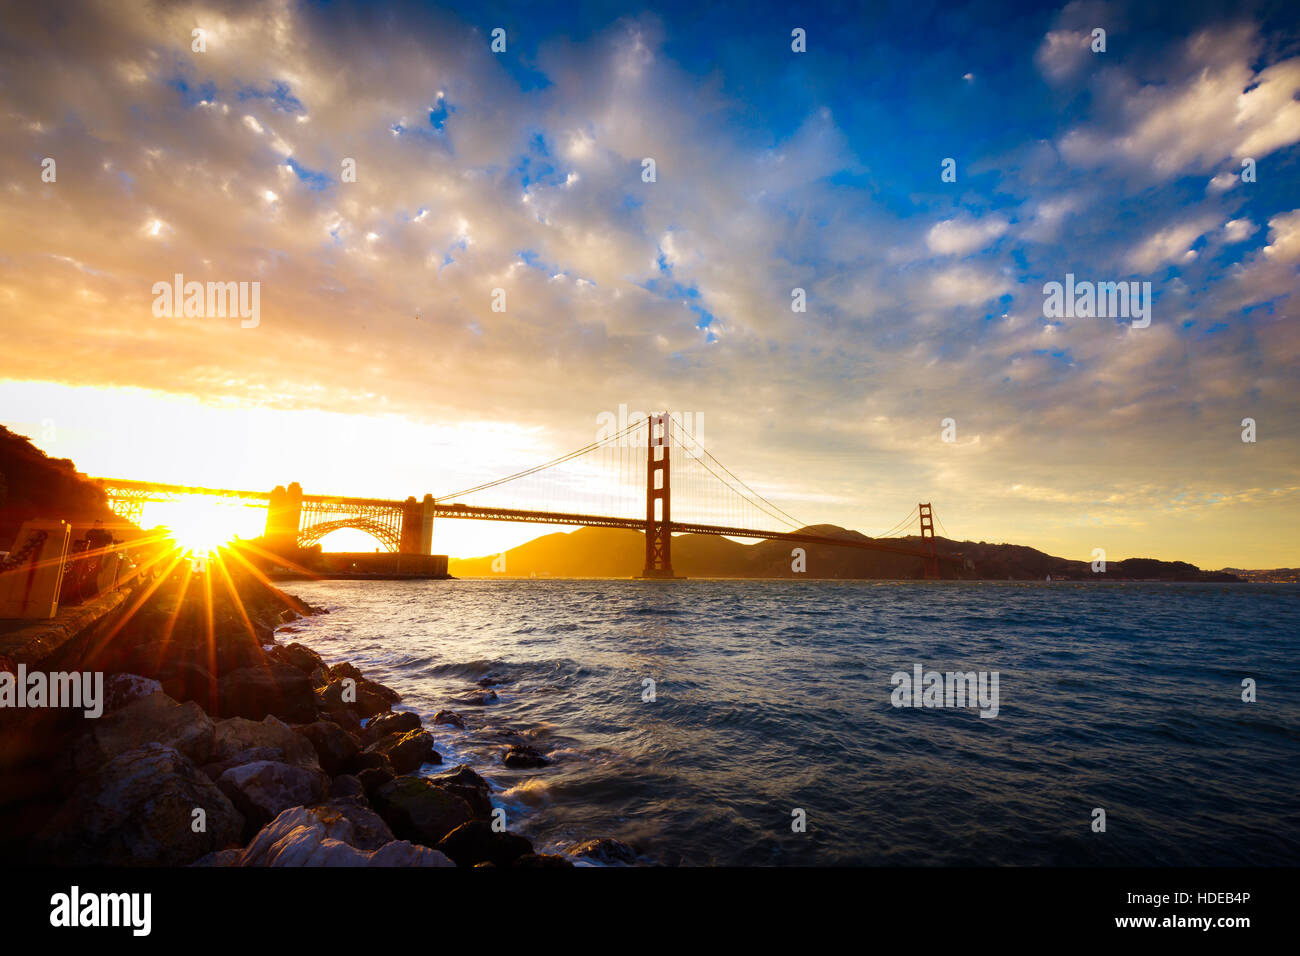 Sunset at the Golden Gate Bridge with sun starburst, San Francisco, California - Stock Image